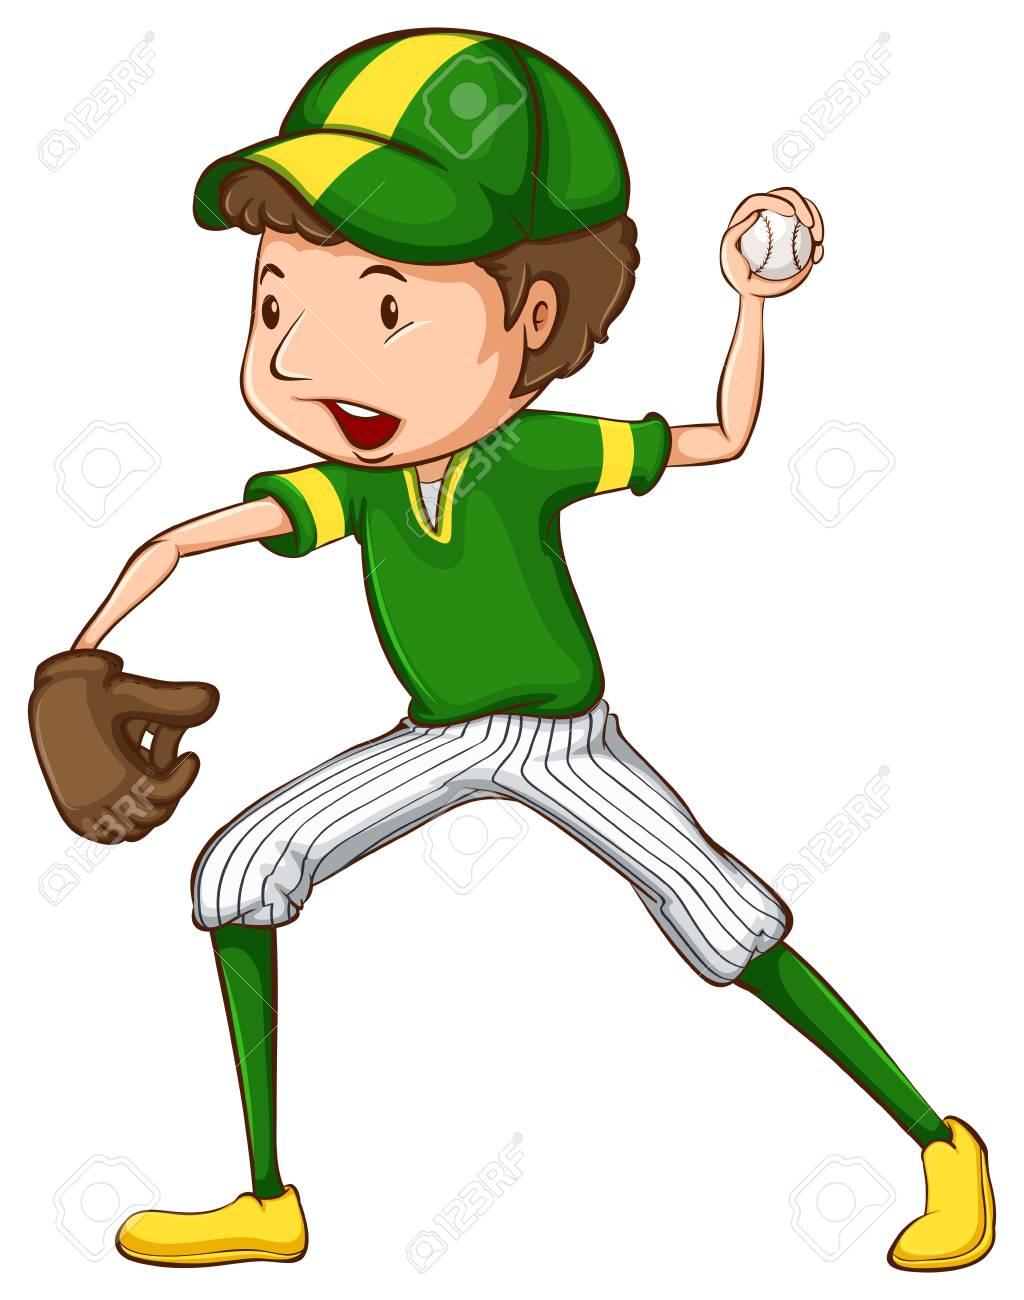 Illustration of a boy playing baseball.